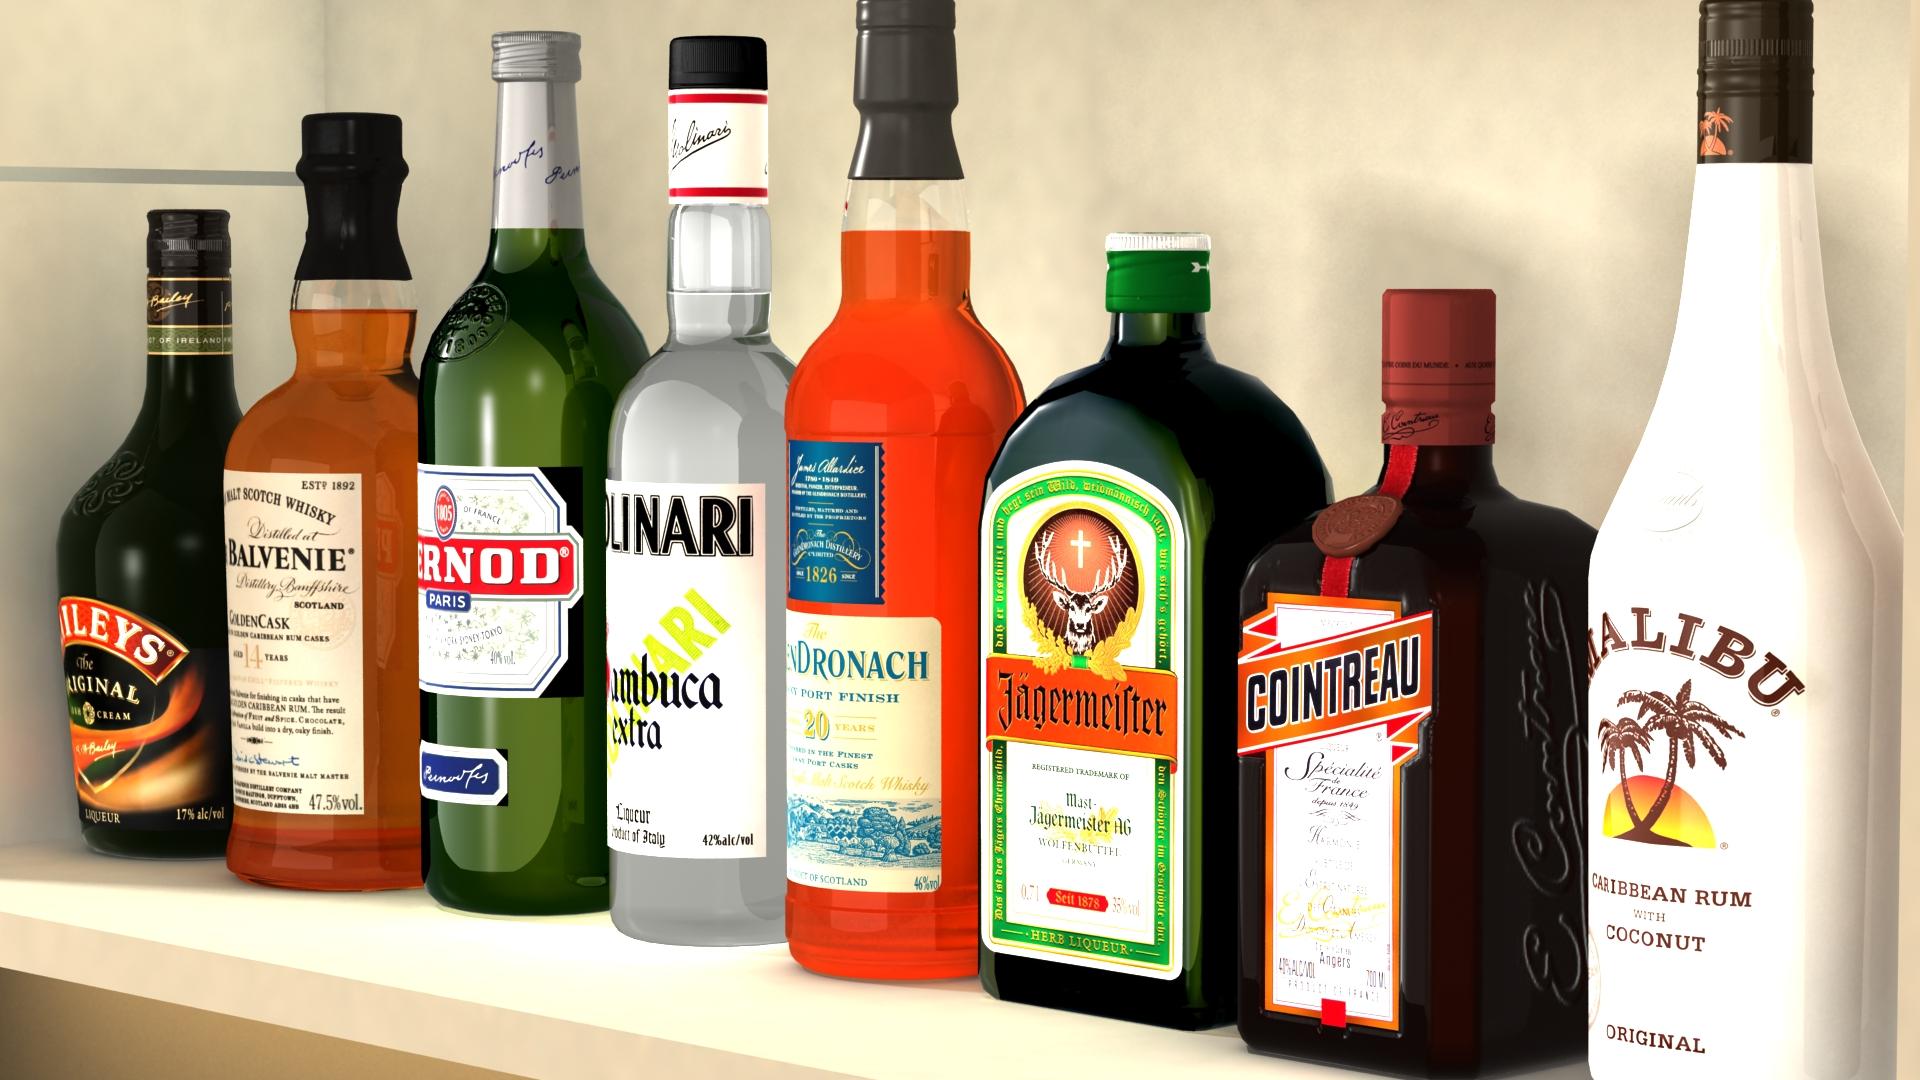 liquor bottles with bar unit interior vr/ar ready 3d model 3ds max  fbx jpeg jpg texture obj 279245